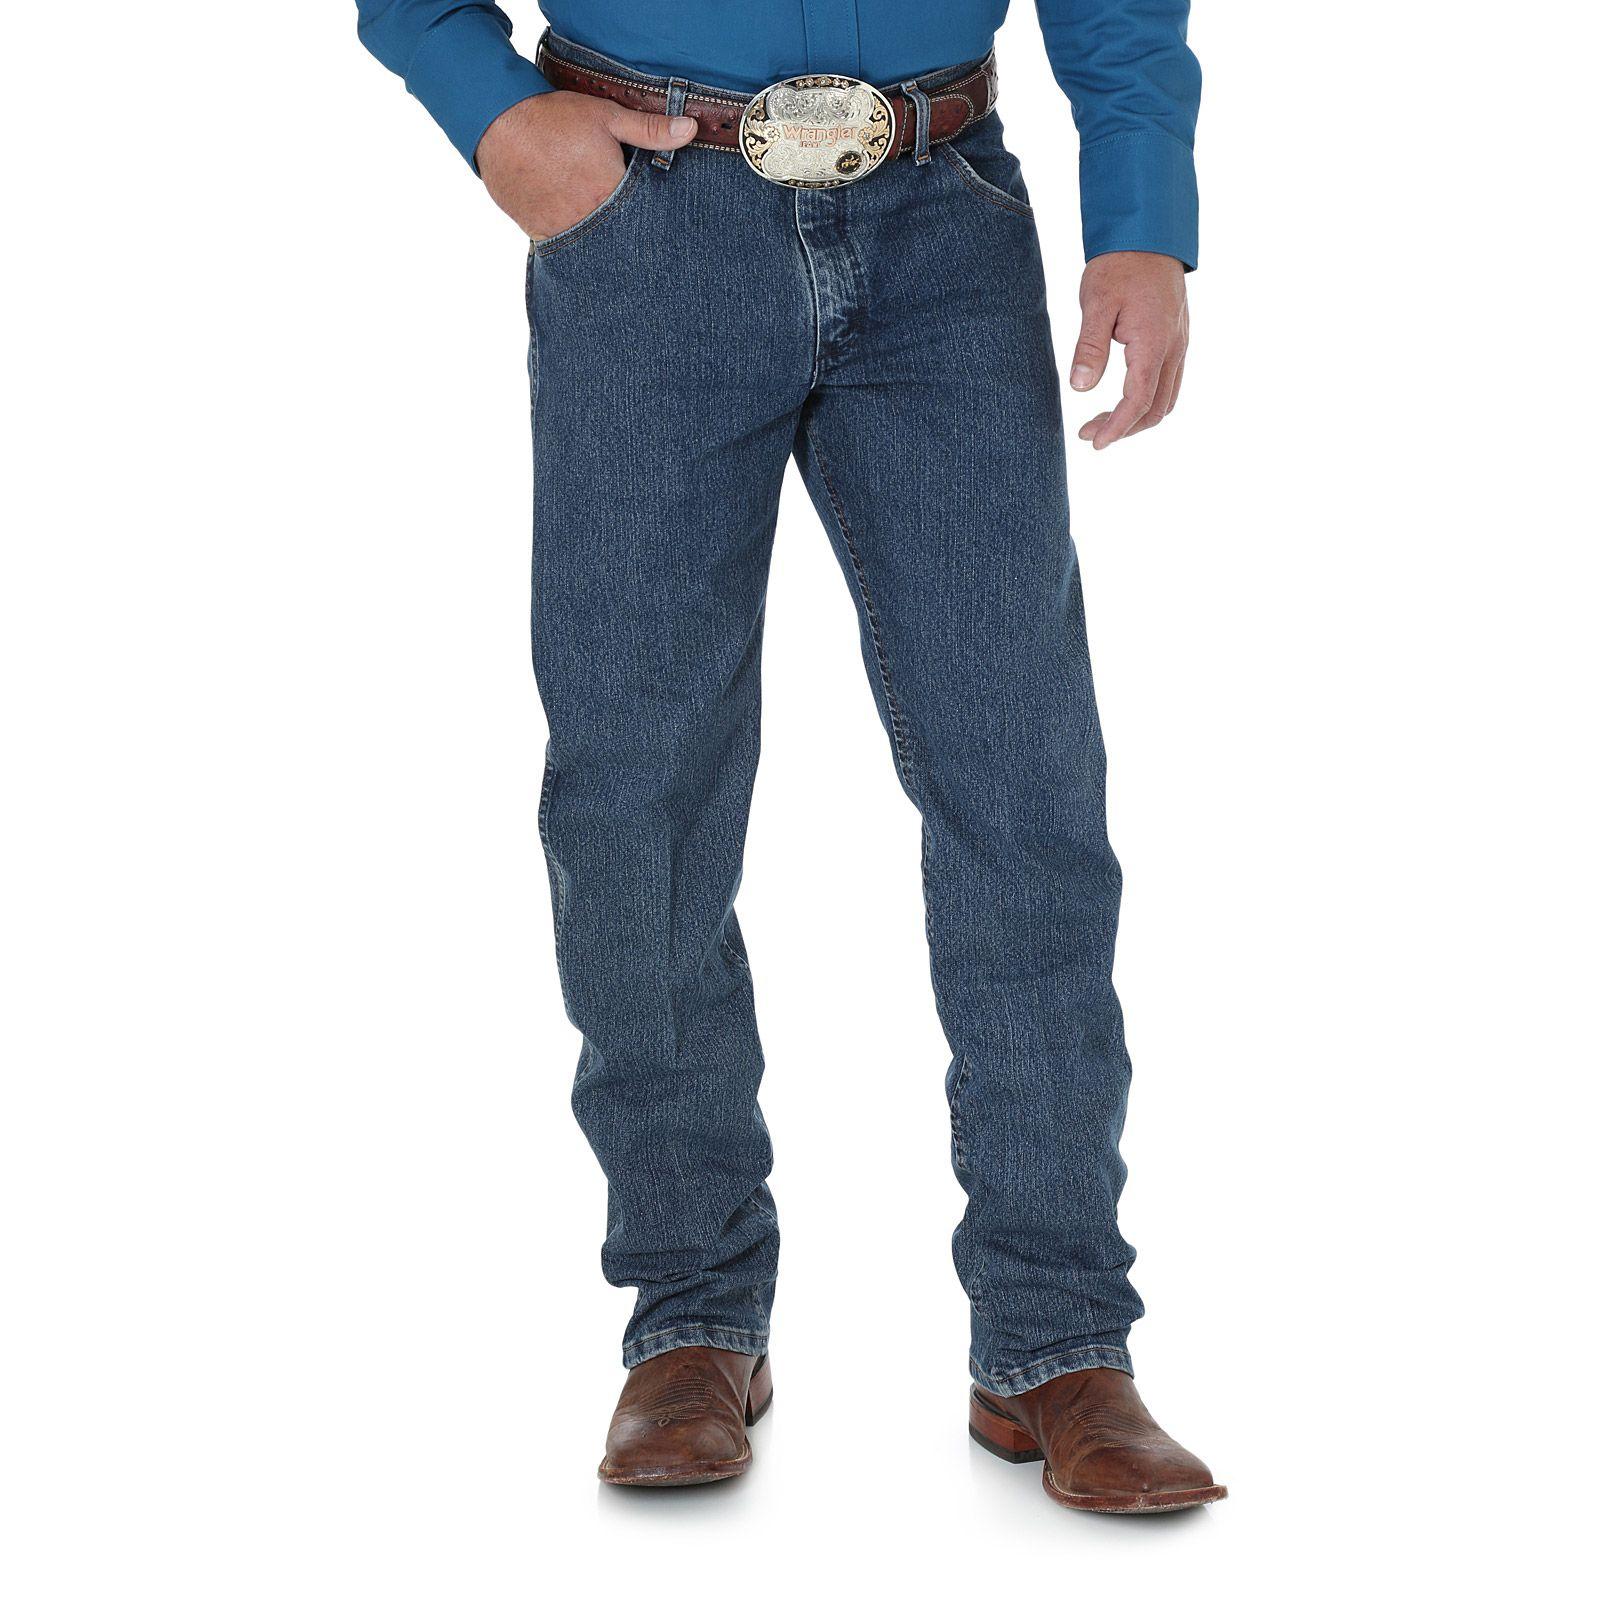 Regular Fit Jean 47MACMT